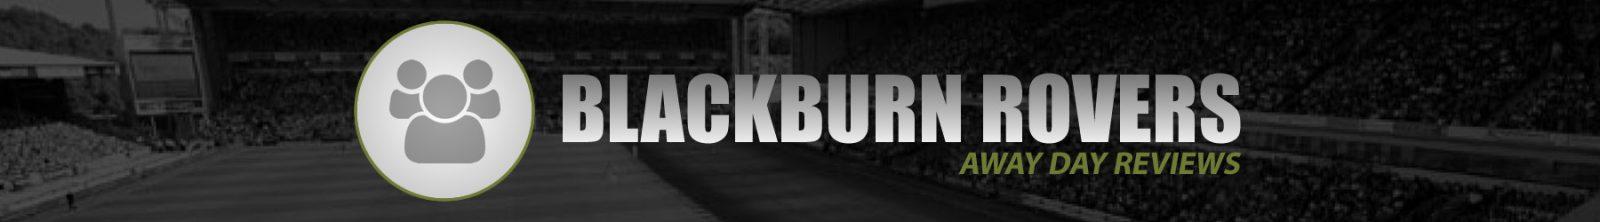 Review Blackburn Rovers